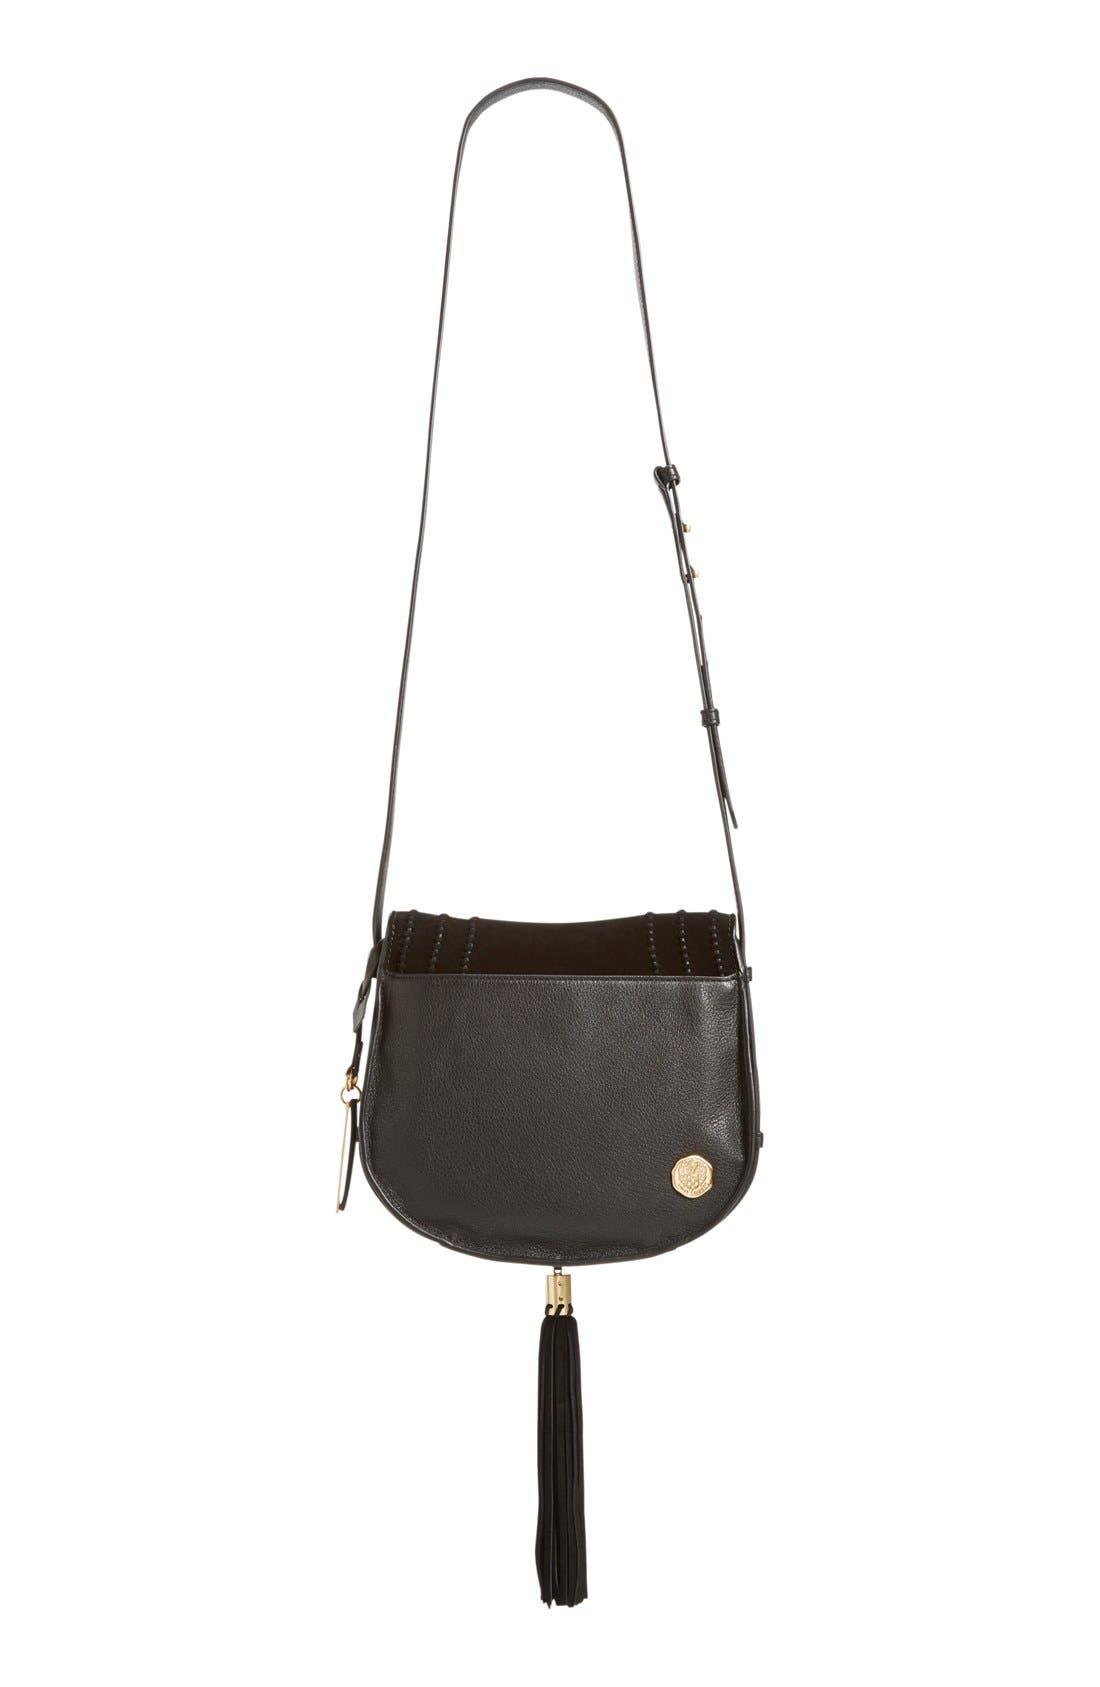 VINCE CAMUTO, 'Izzi' Tassel Leather & Suede Crossbody Bag, Alternate thumbnail 2, color, 001